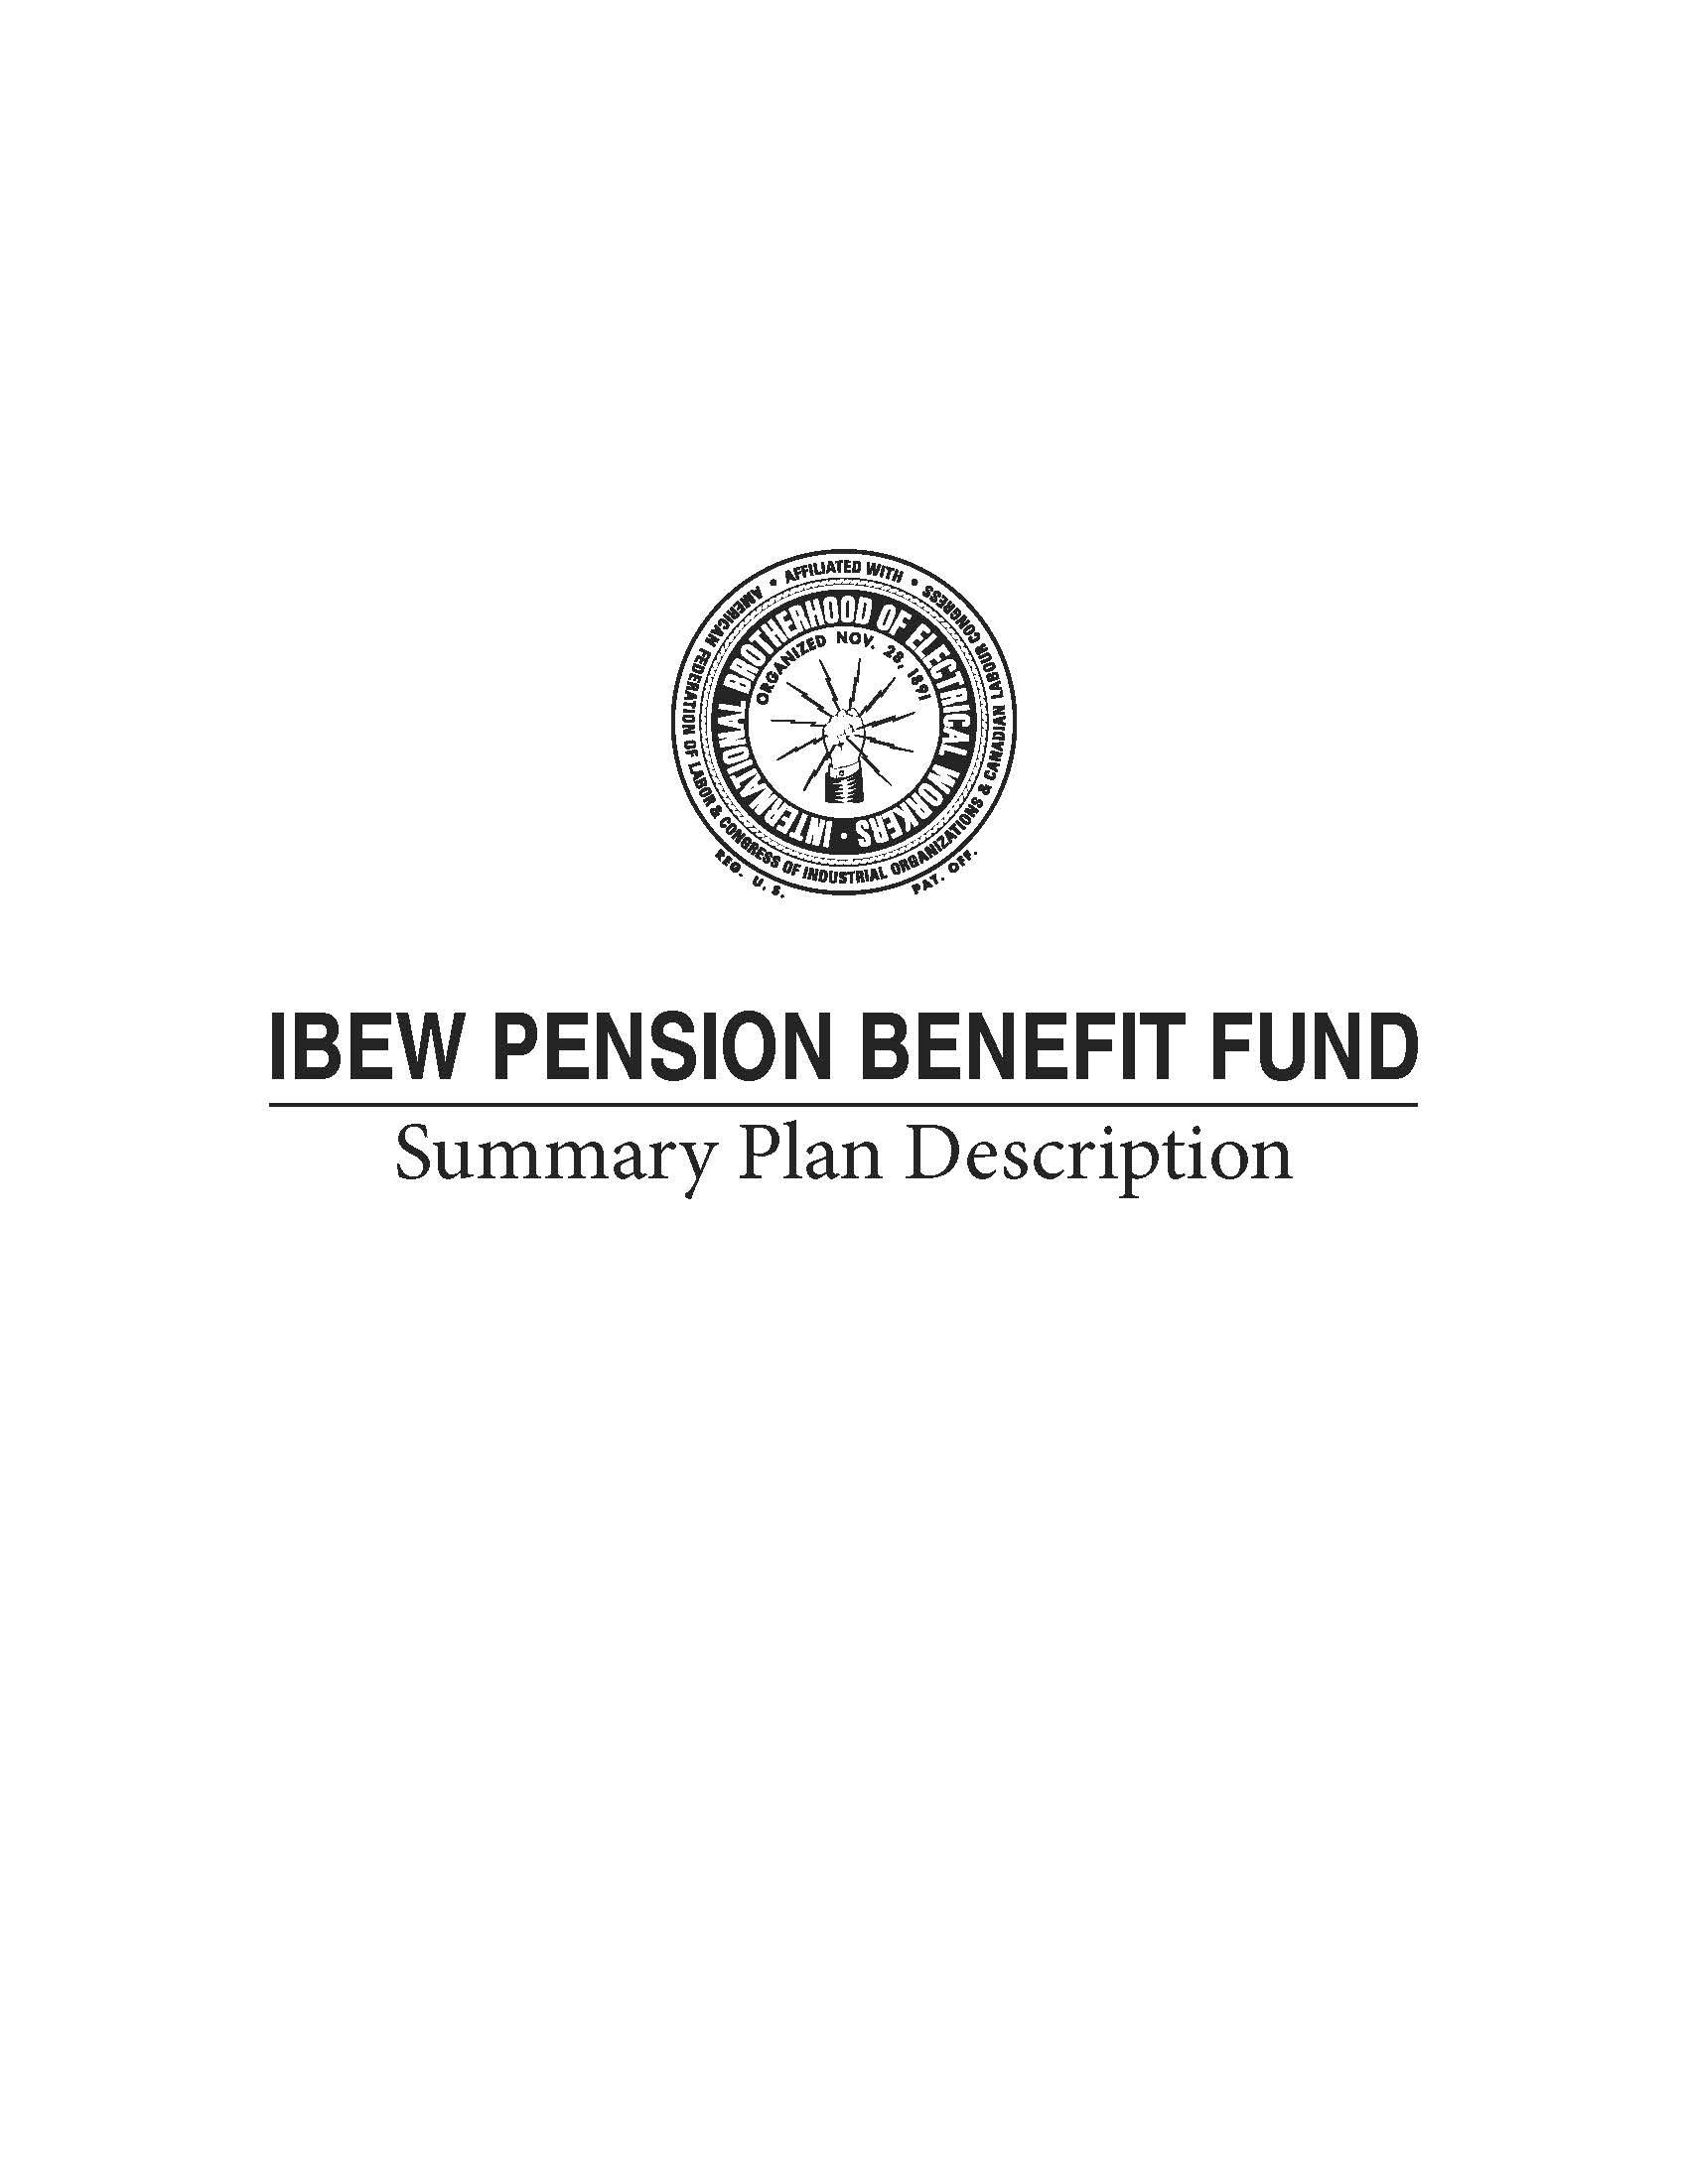 IBEW > Pension & Reciprocity